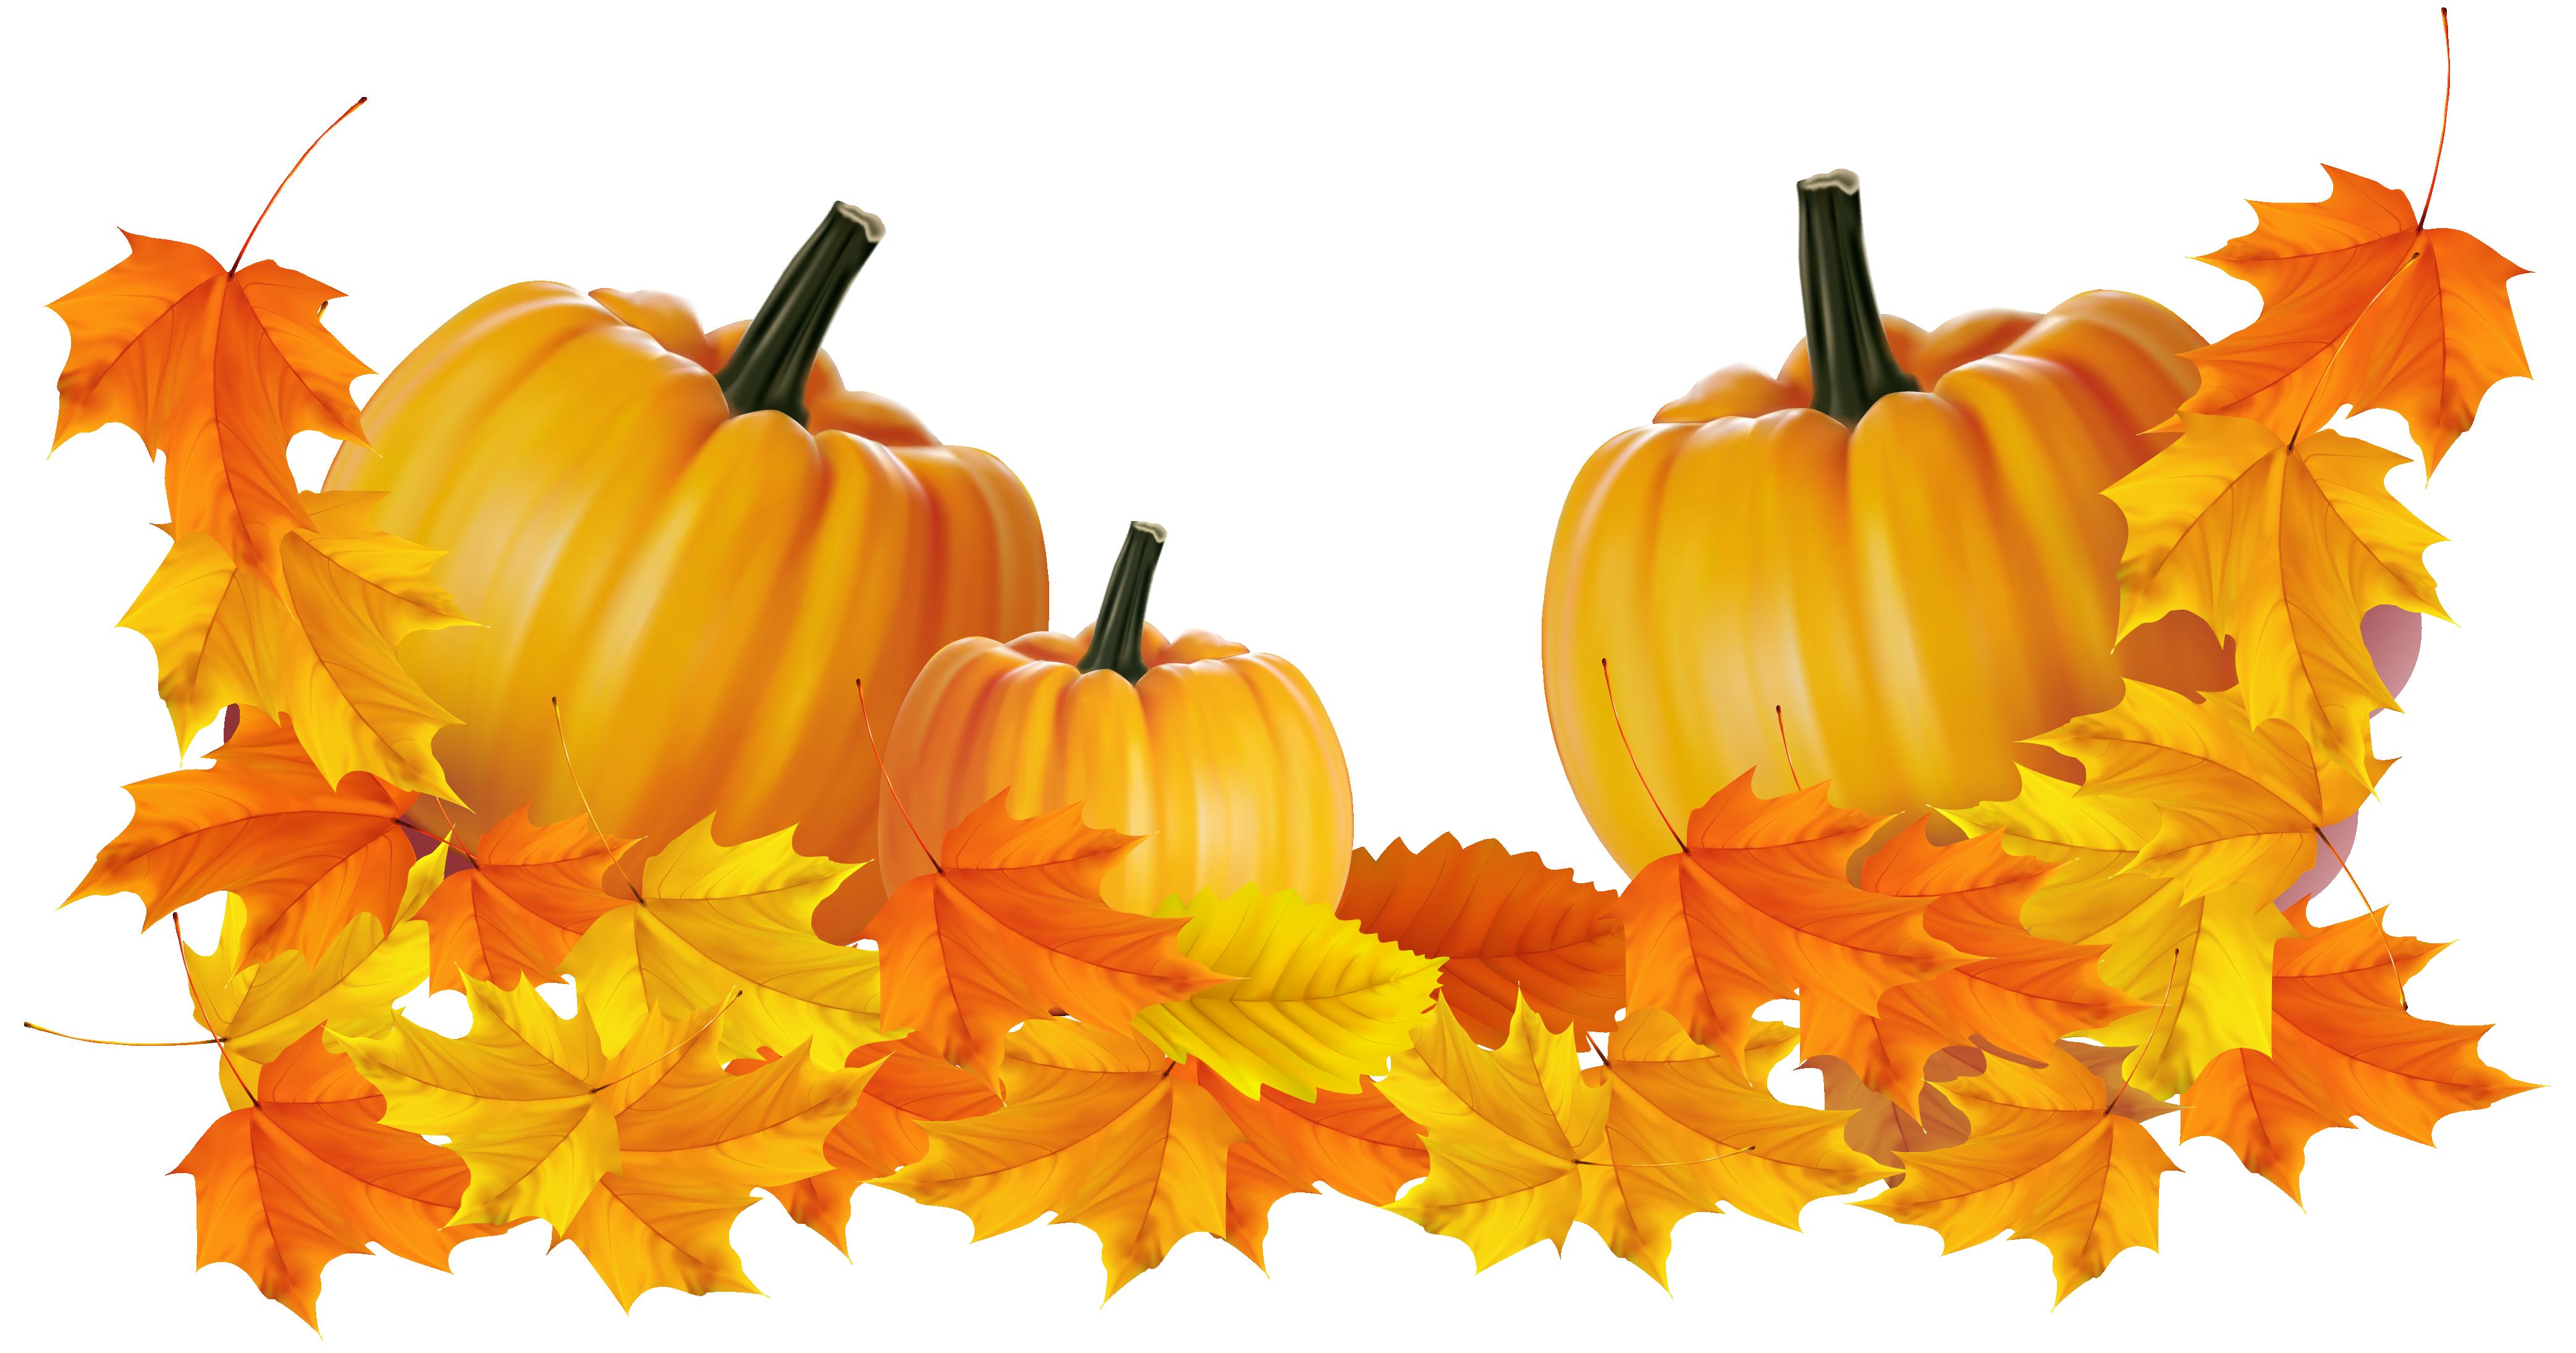 Pumpkin clipart black background vector library clipart images pumpkin small transparent - Clipground vector library